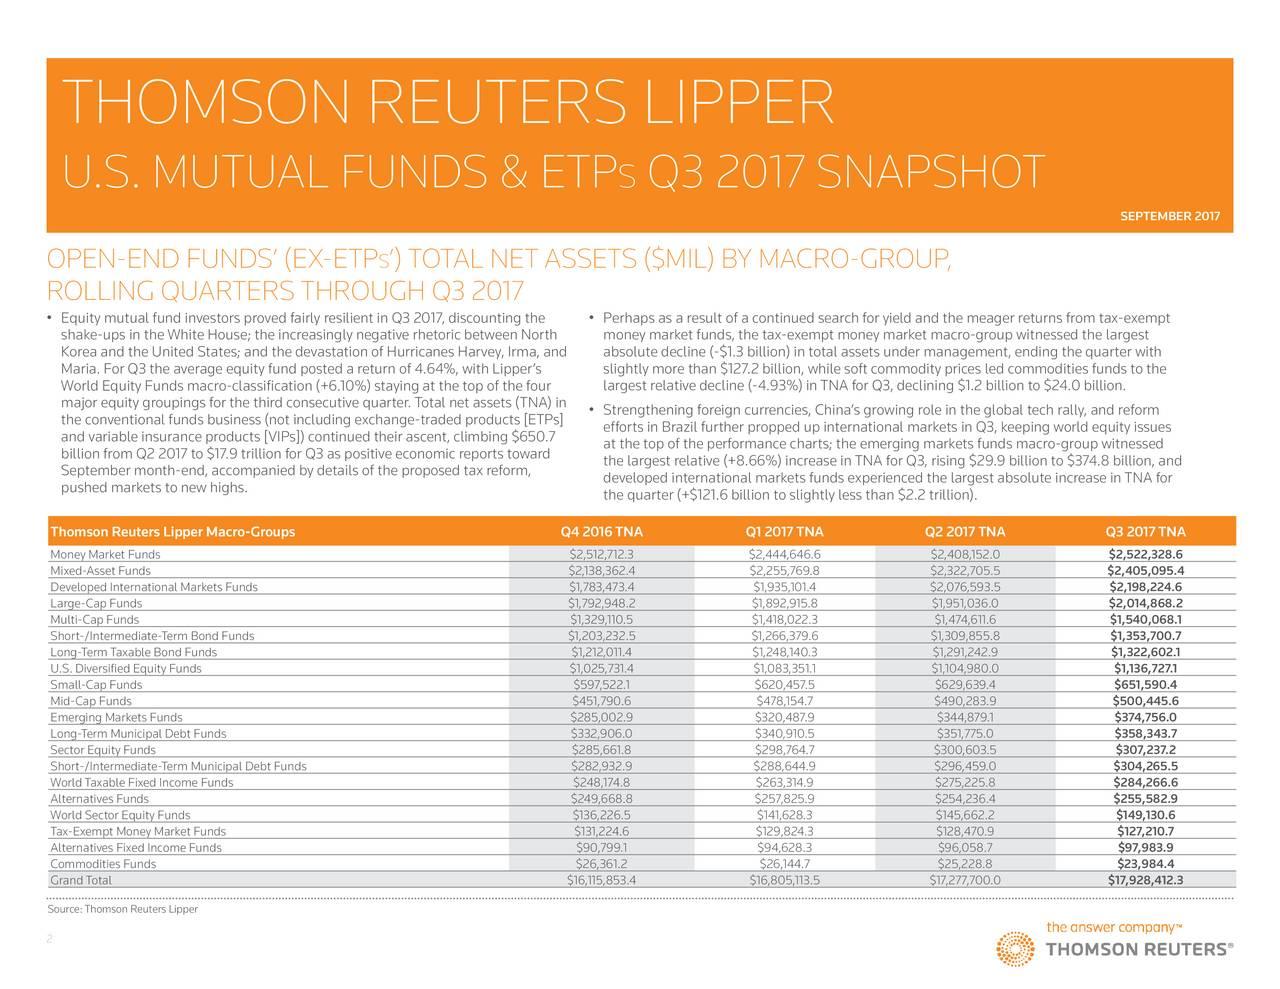 Thomson Reuters Lipper U.S. Mutual Funds & ETPs Q3 2017 ...